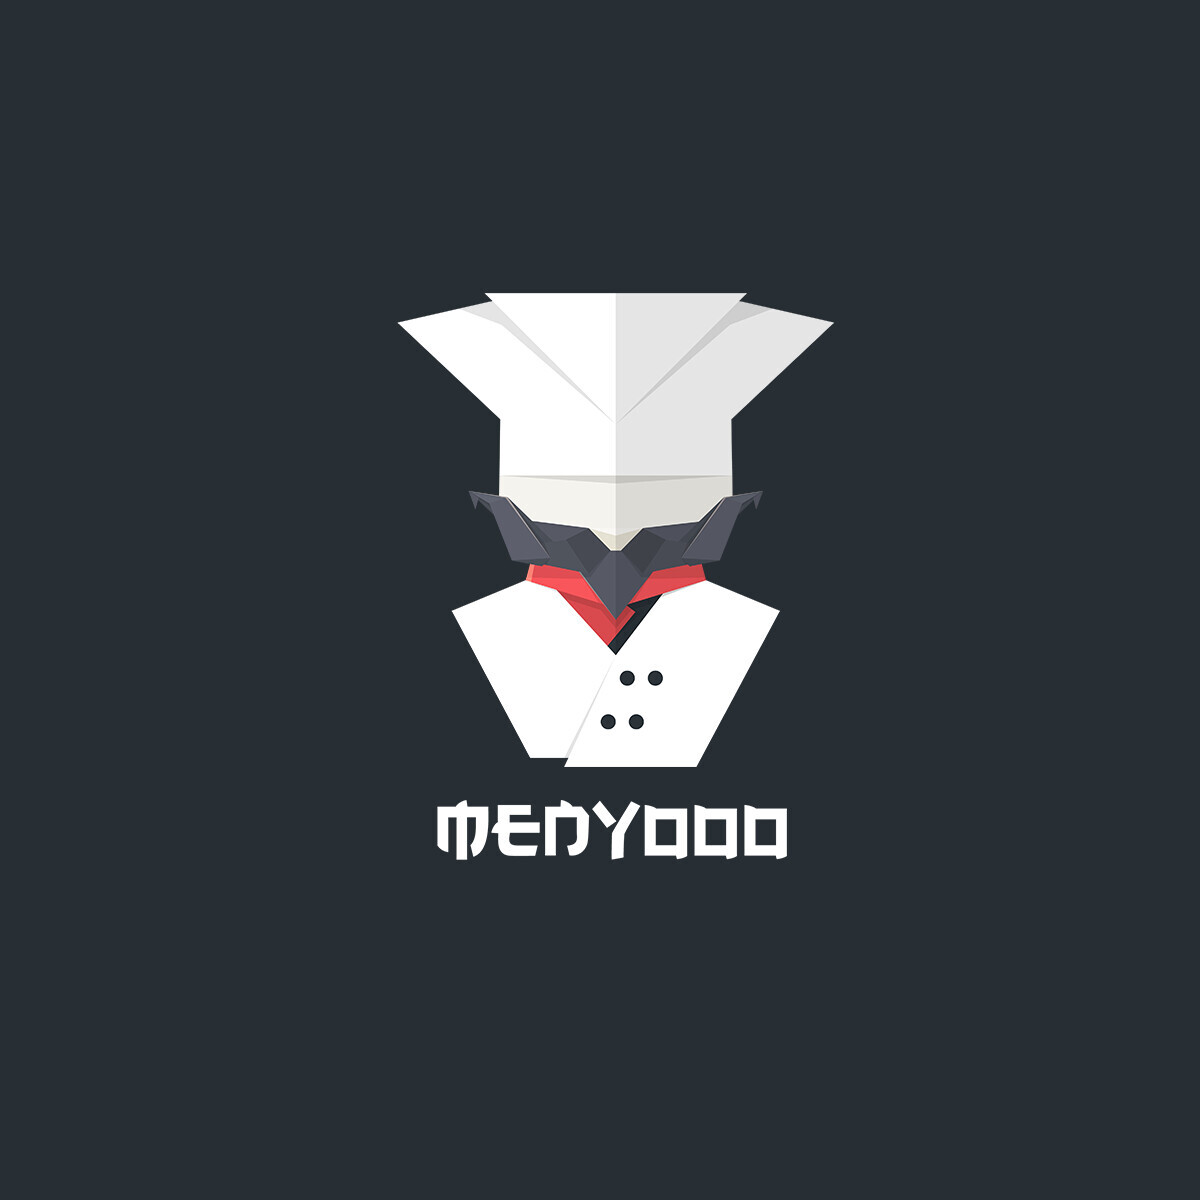 MENYOOO